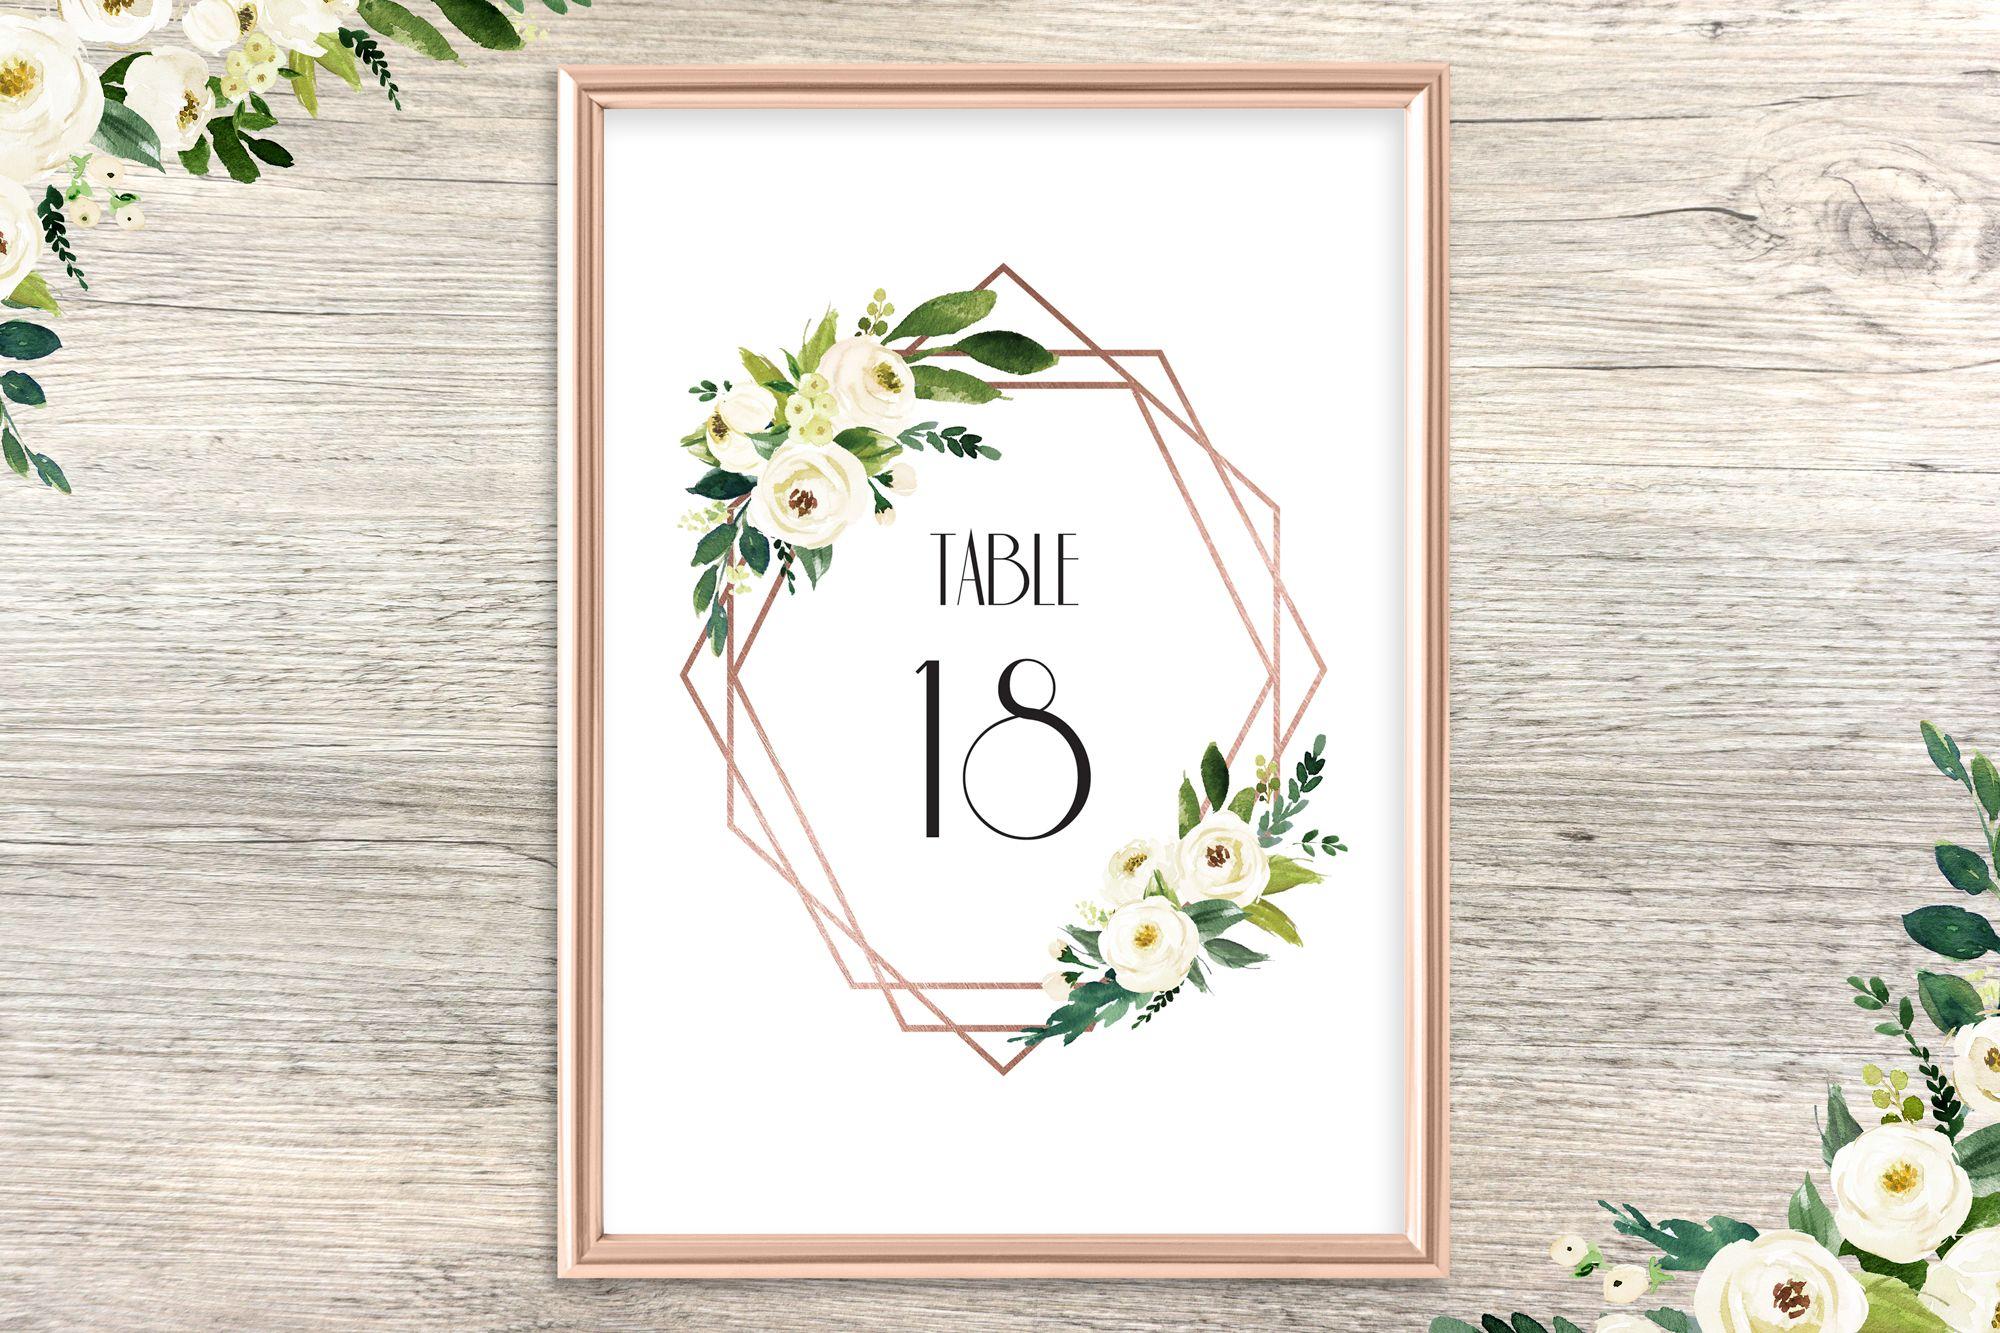 1920s wedding decoration ideas  Printable table numbersrose gold table numbers wedding table